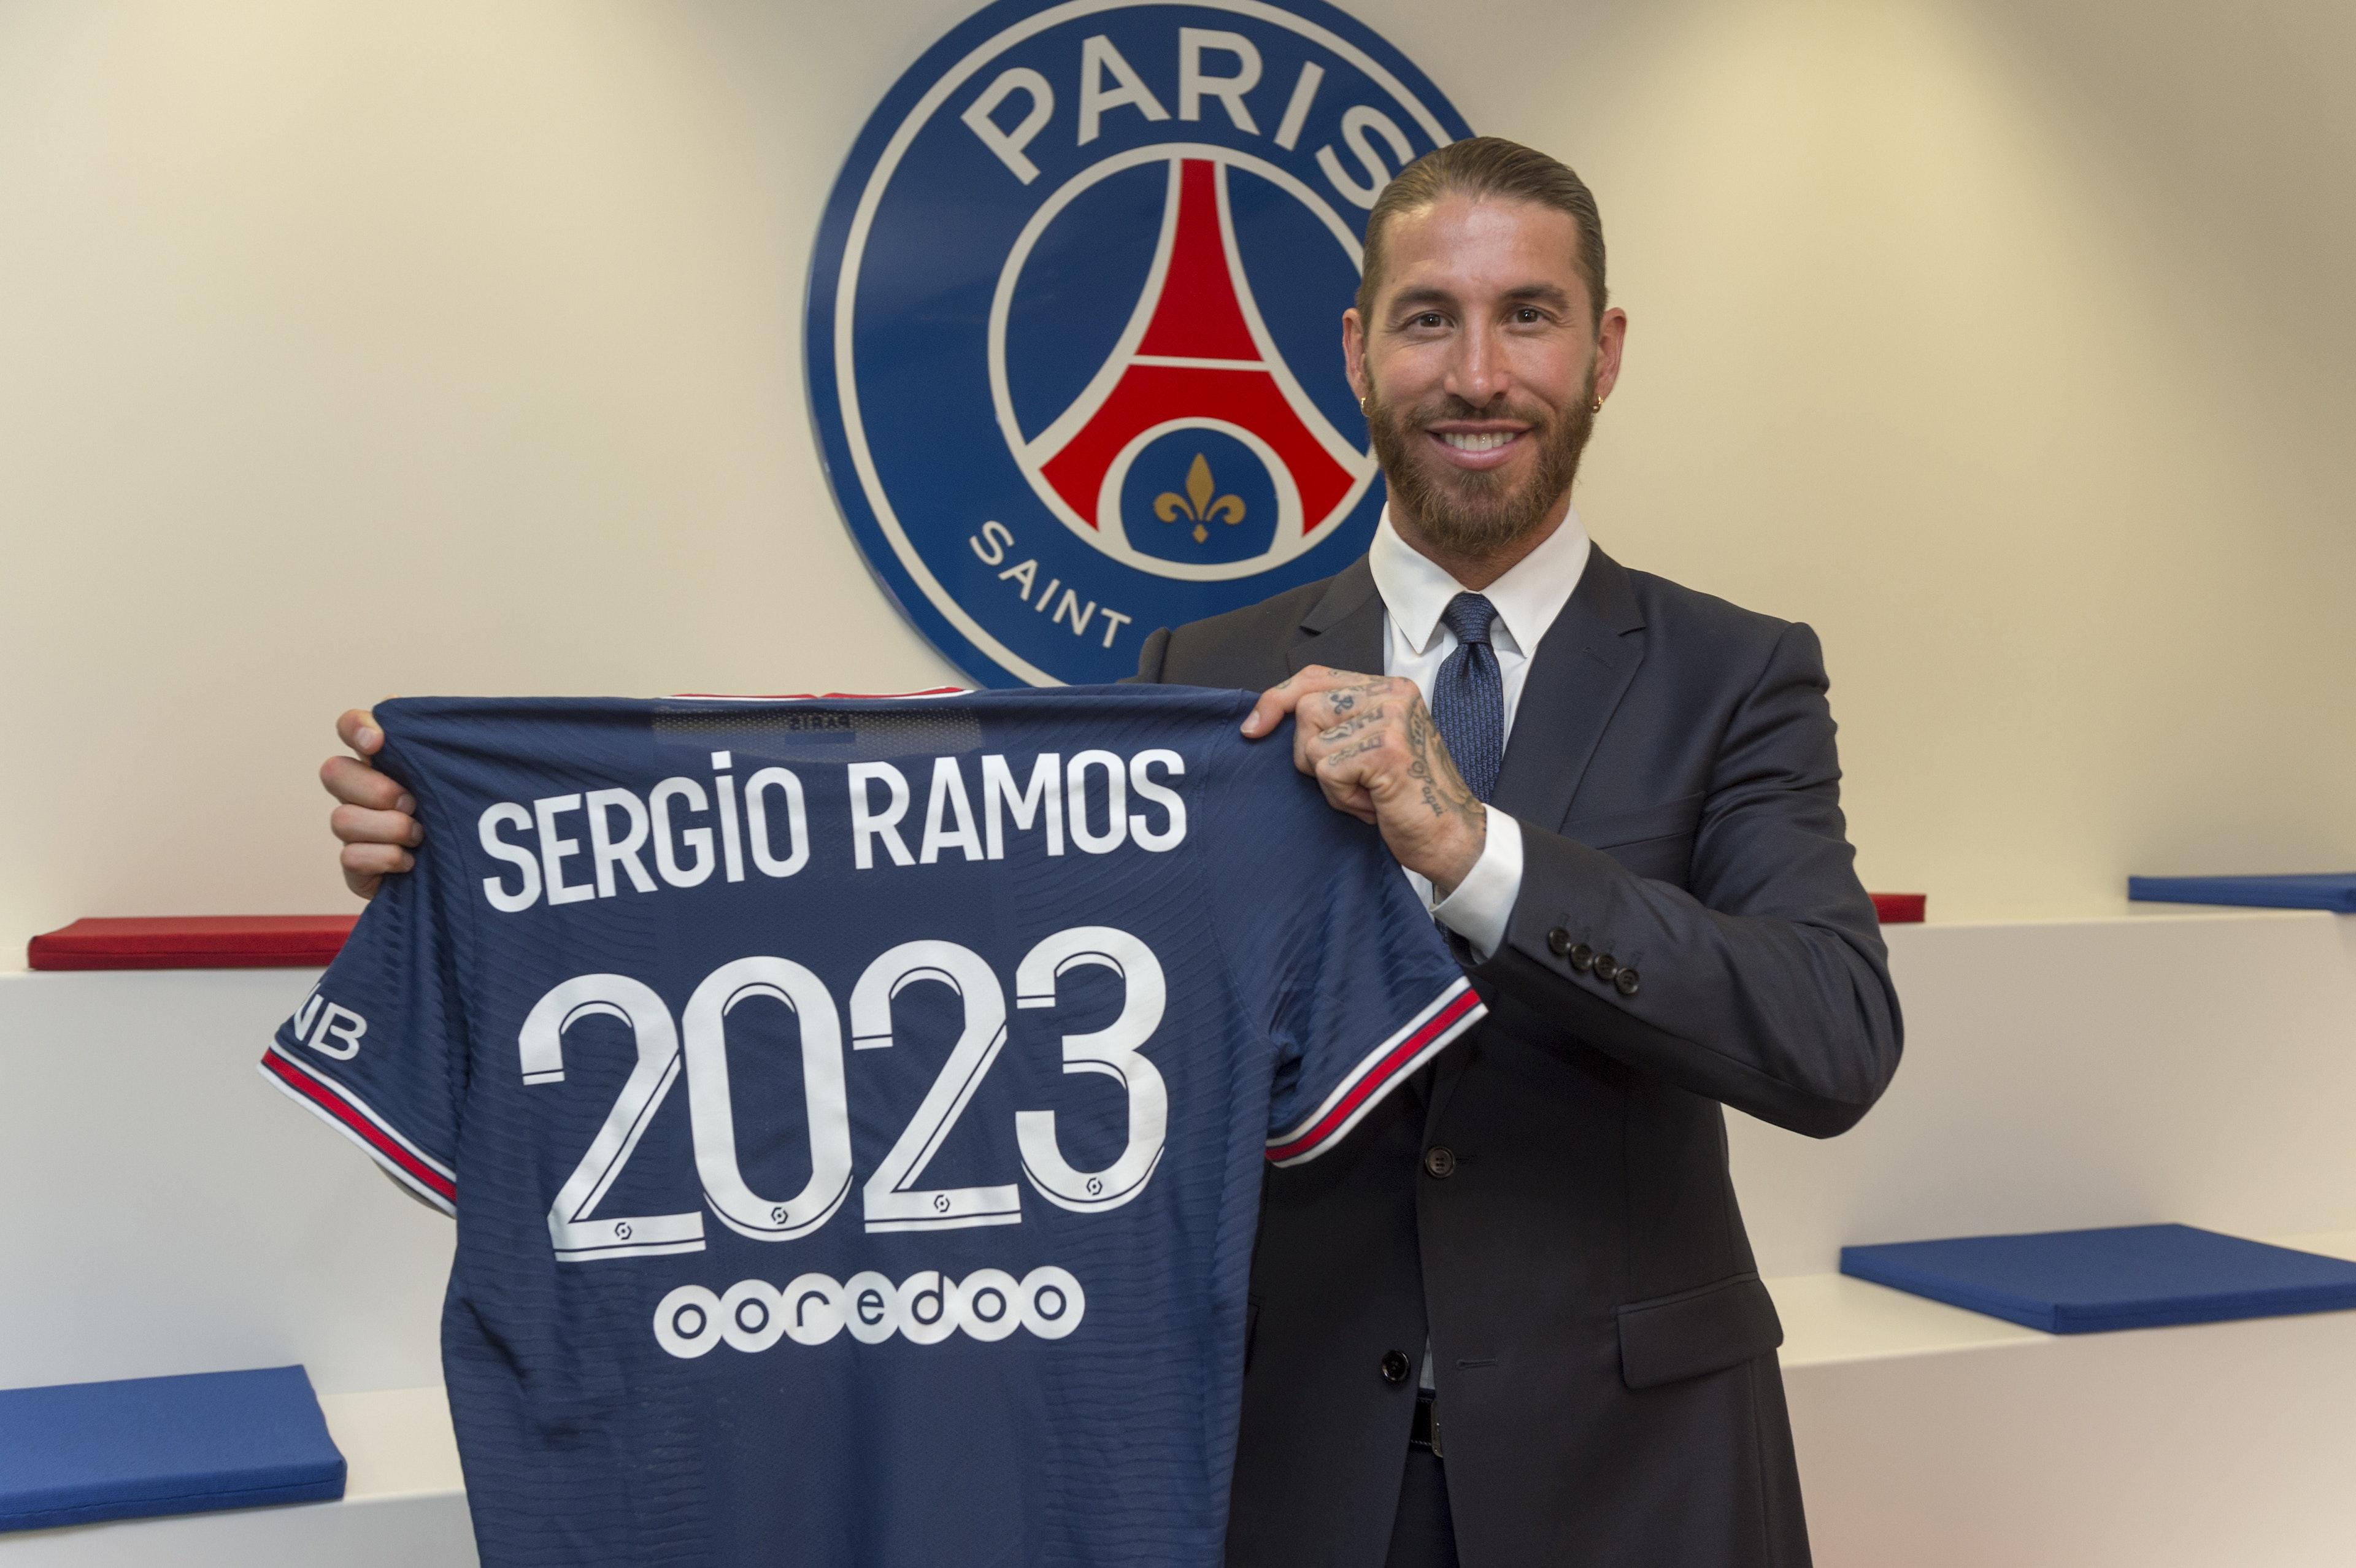 Paris Saint-Germain Unveil New Signing Sergio Ramos